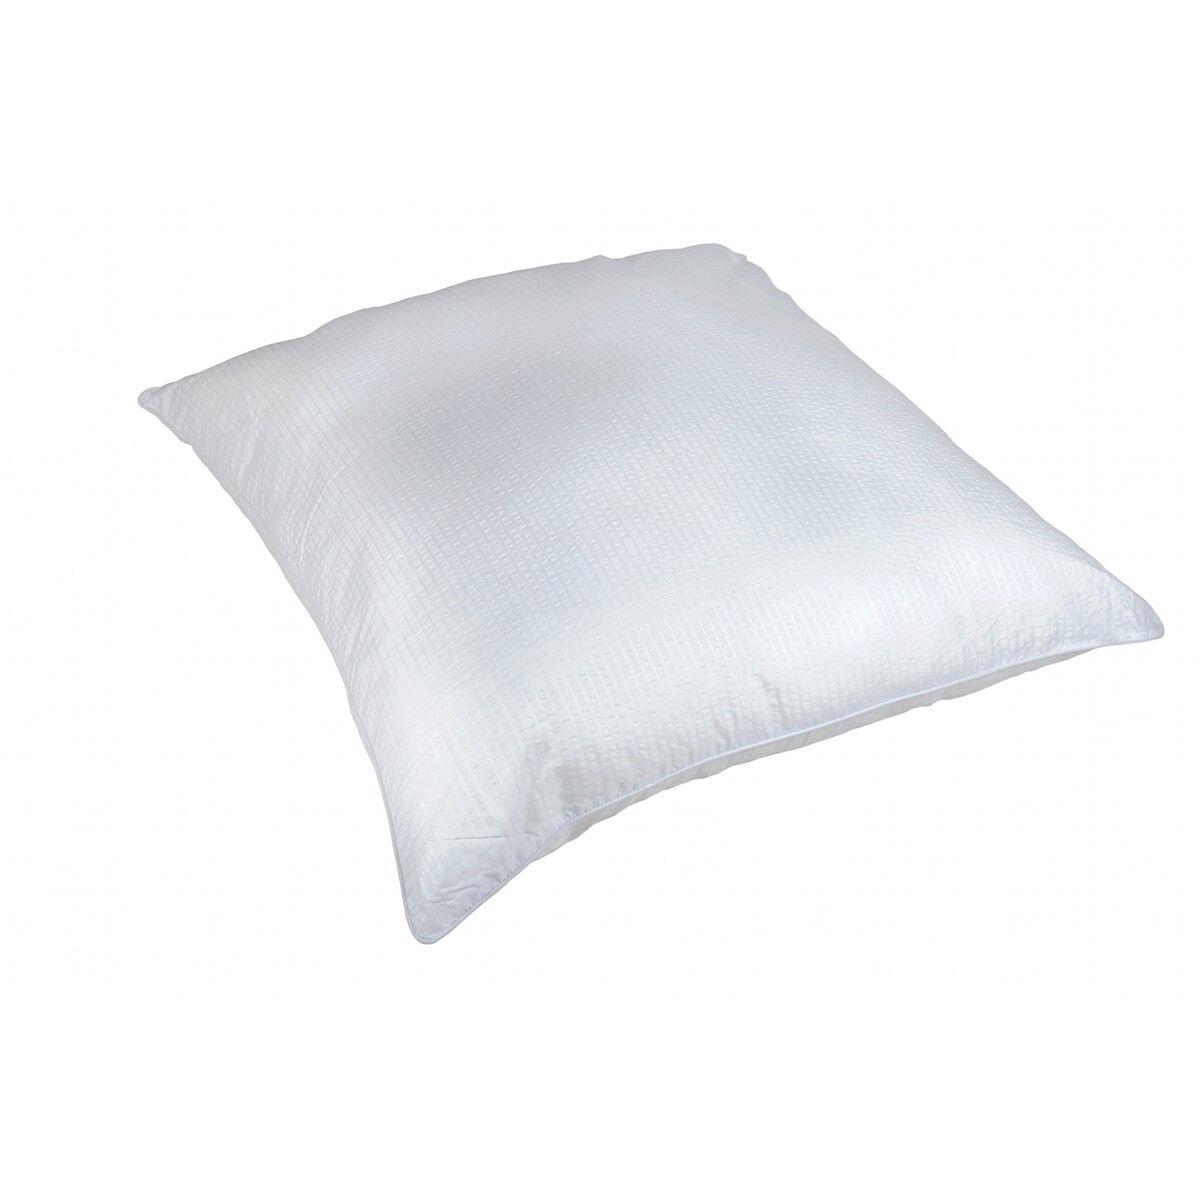 Linandelle Polyester Blanc 65x65 cm